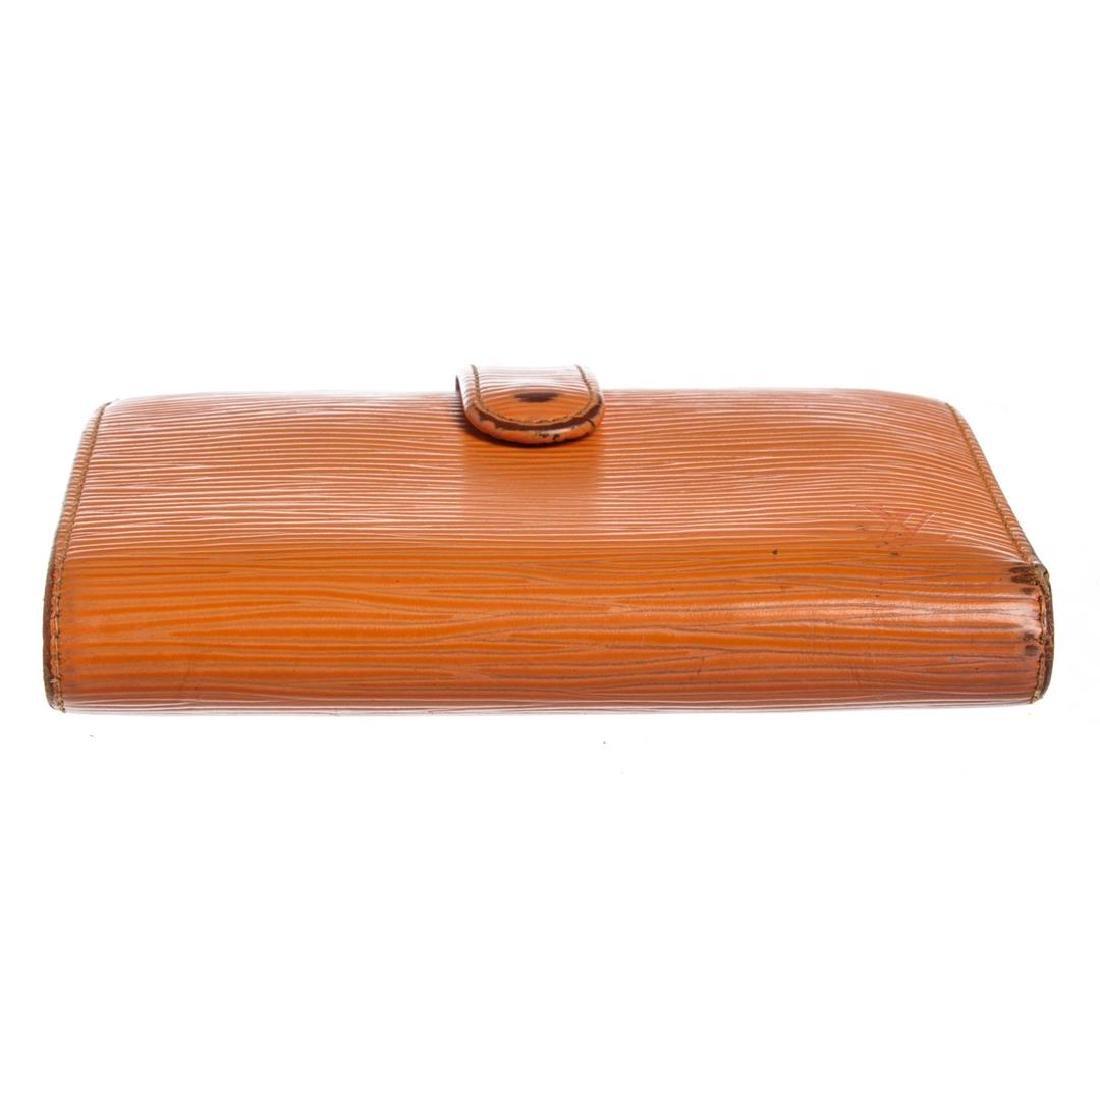 Louis Vuitton Orange Epi Leather French Purse Wallet - 5